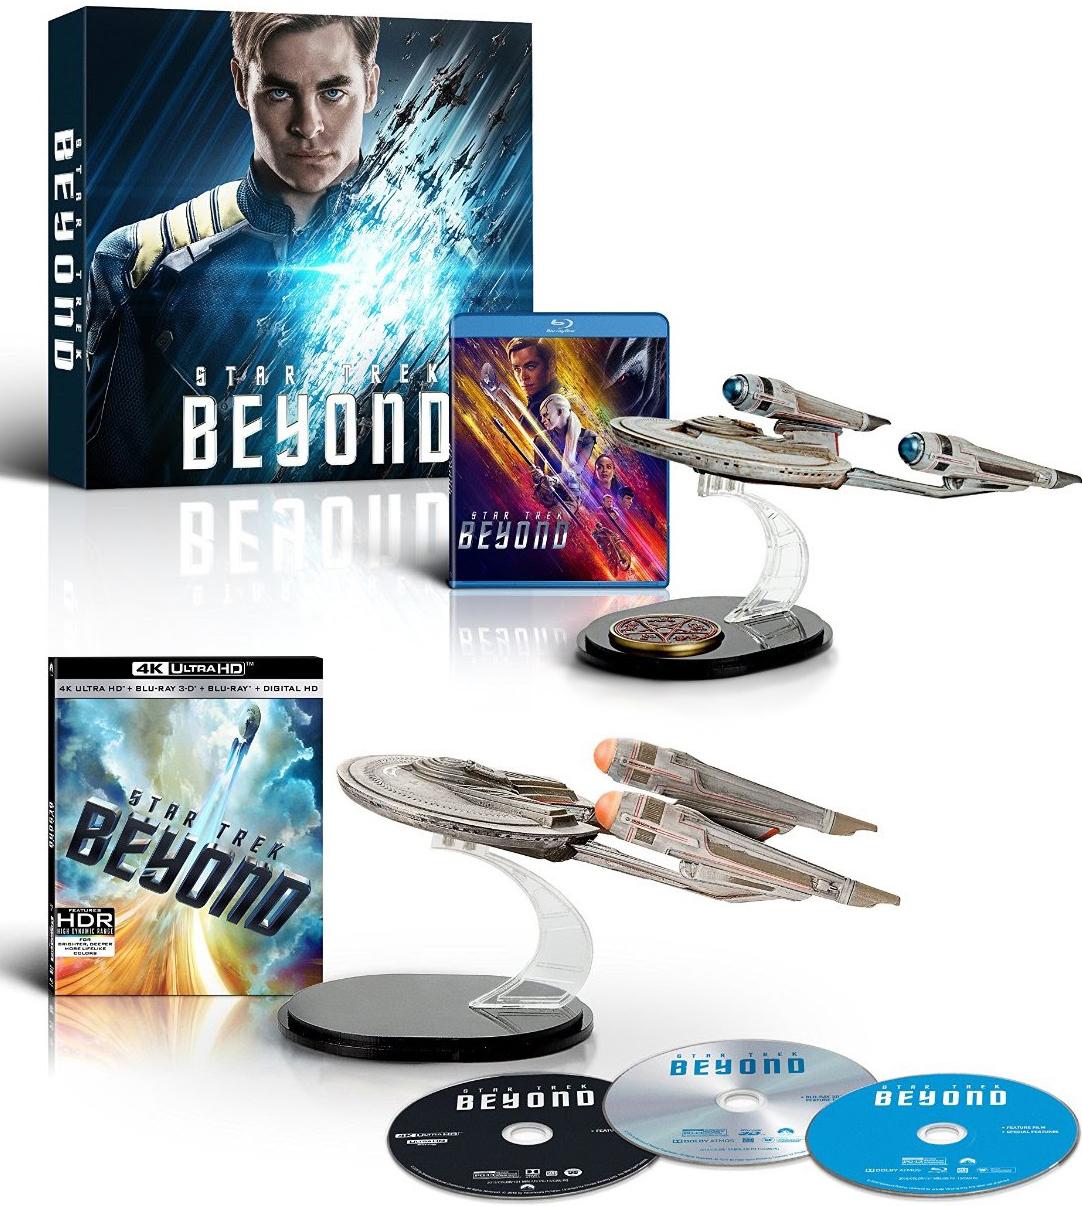 Amazon Star Trek Beyond home video QMx USS Franklin promos.jpg